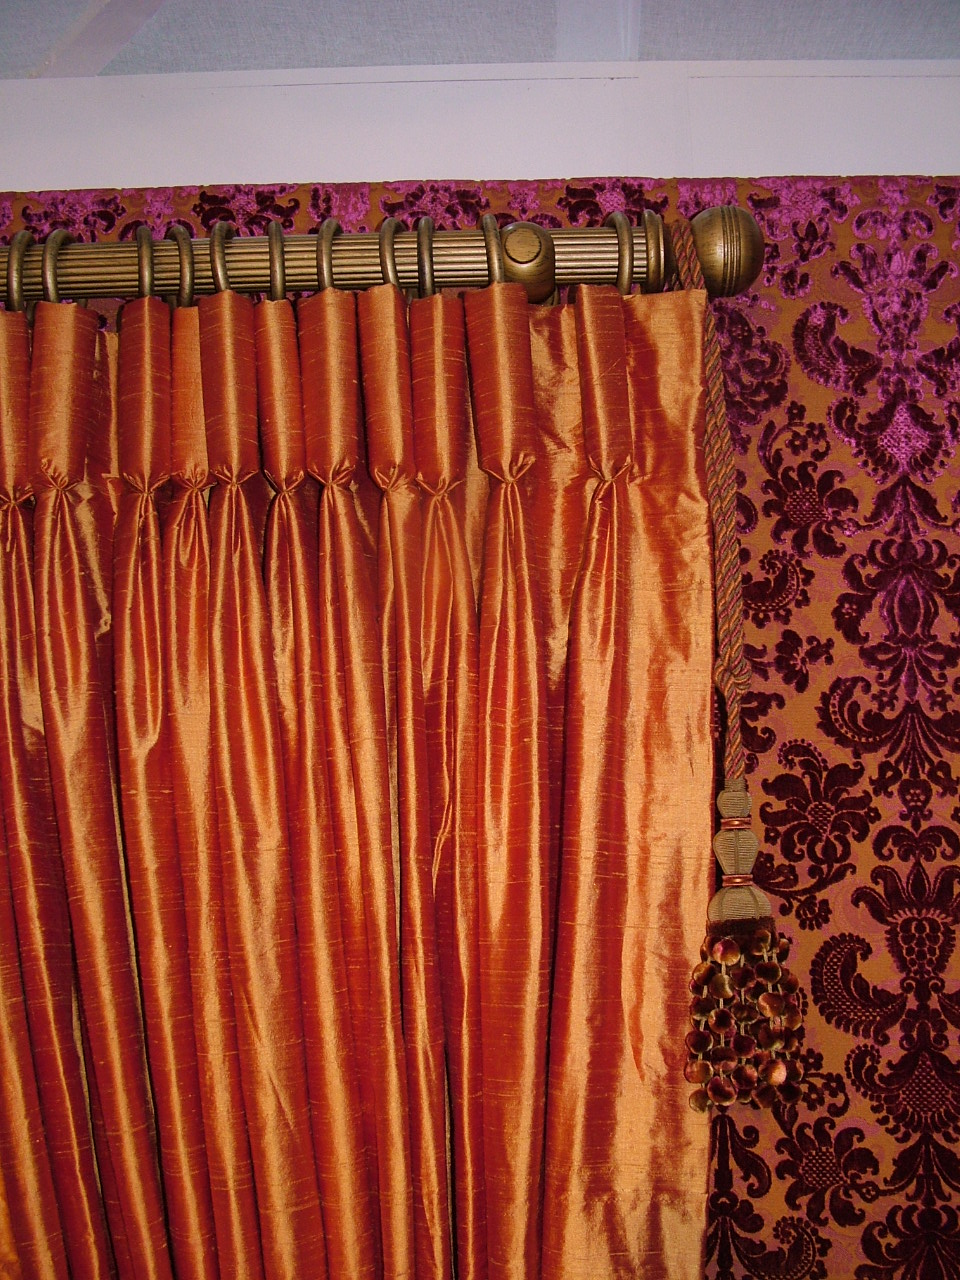 Goblet pleats heading curtain hangfrom  decorative pole